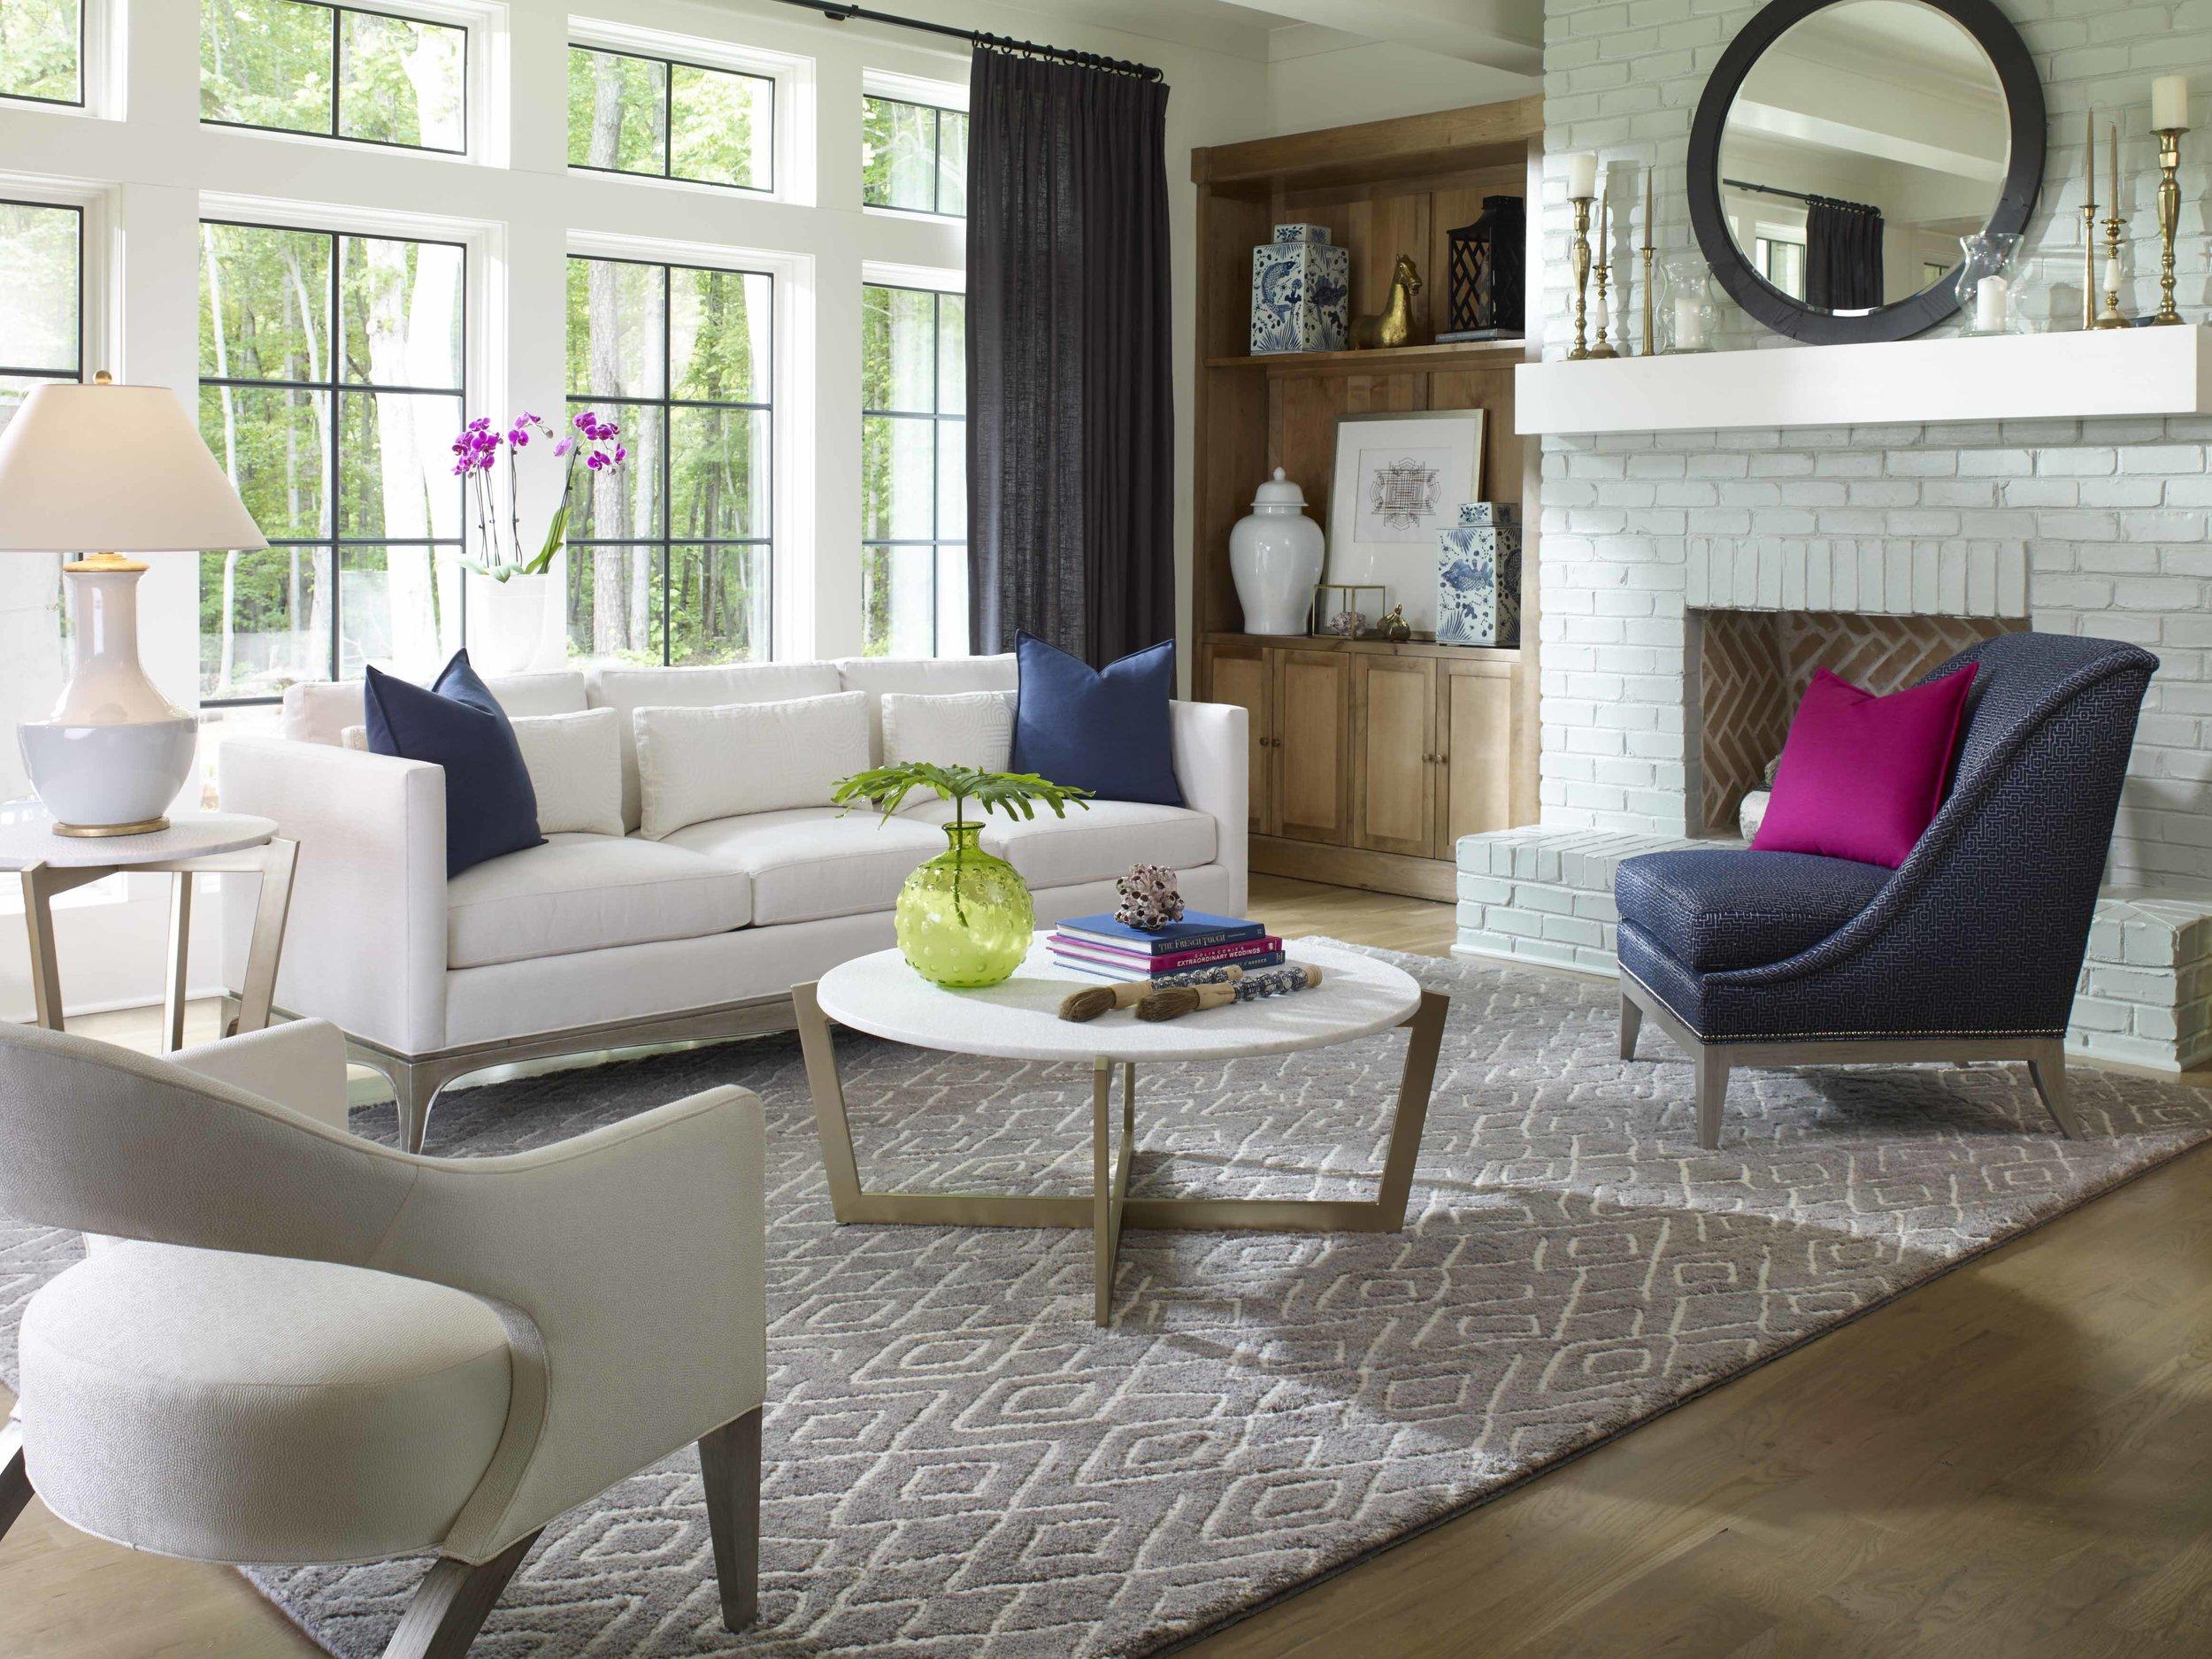 Living Room Decor Ideas Portsmouth, NH